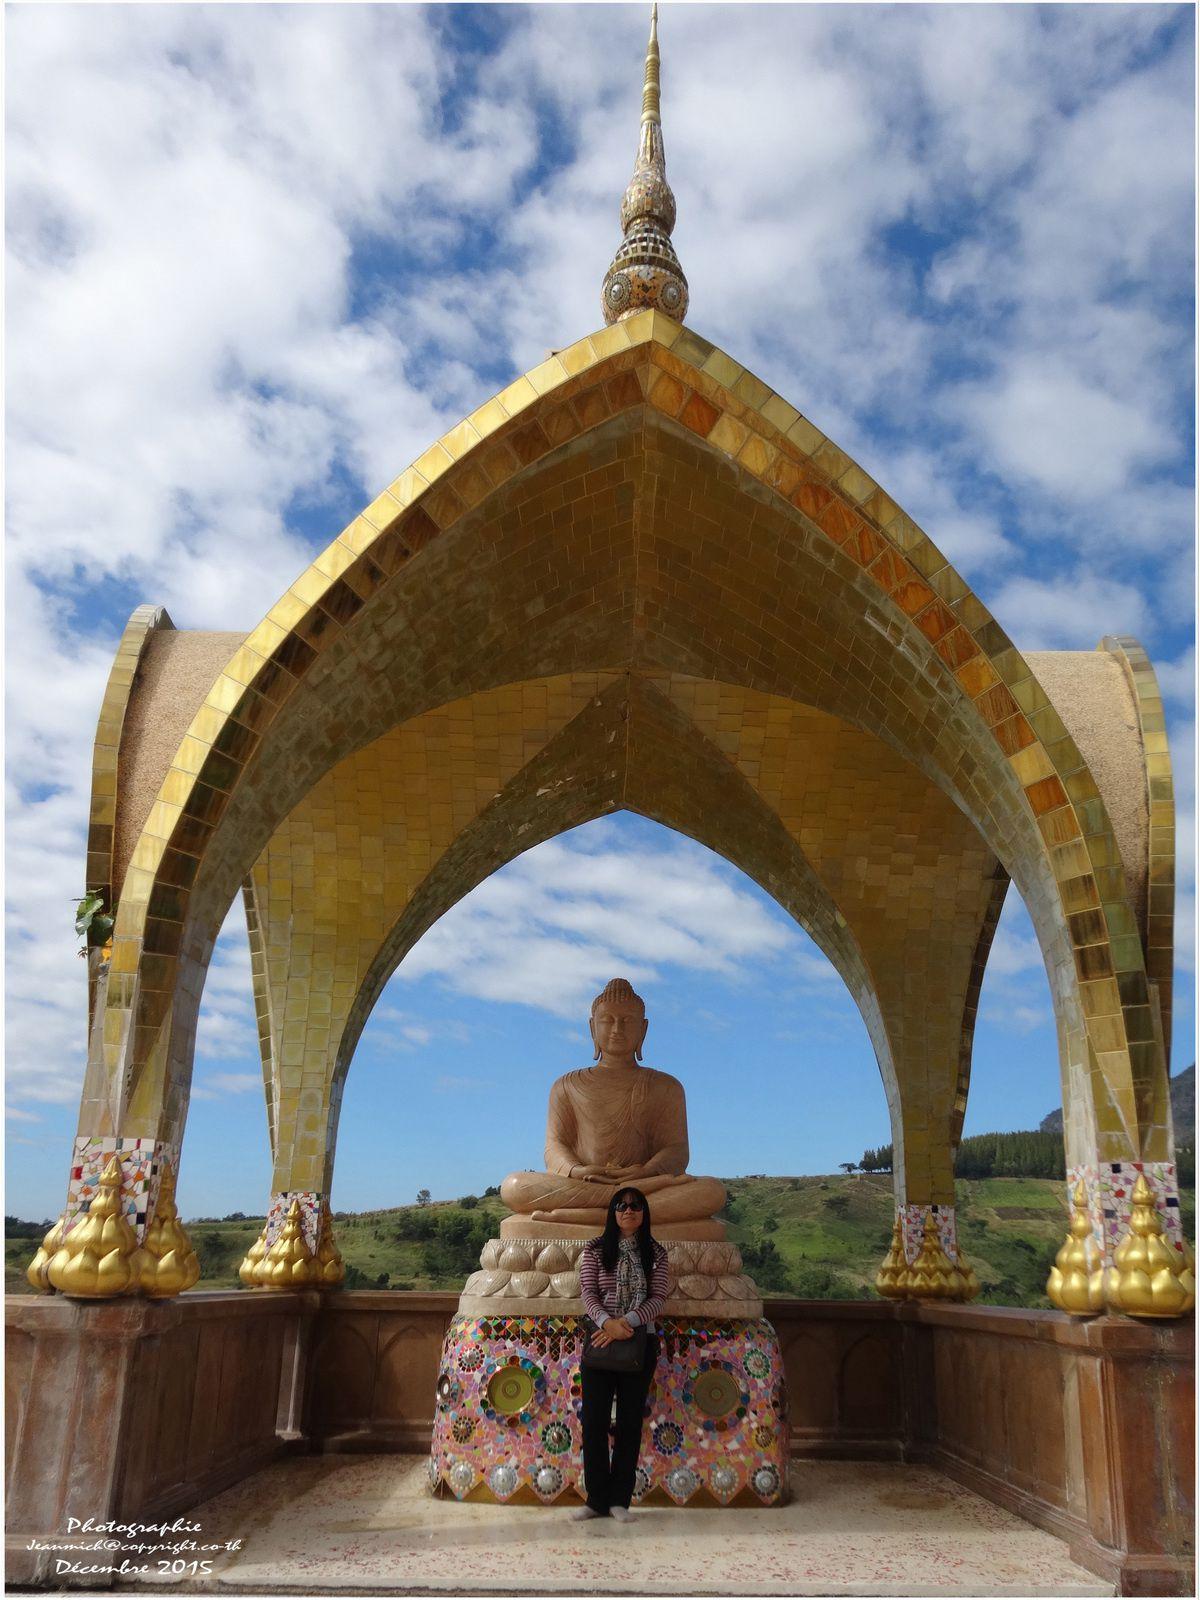 Le superbe temple de Wat Pha Sorn Kaew (II) วัดพระธาตุผาแก้ว Province de Phetchabun)